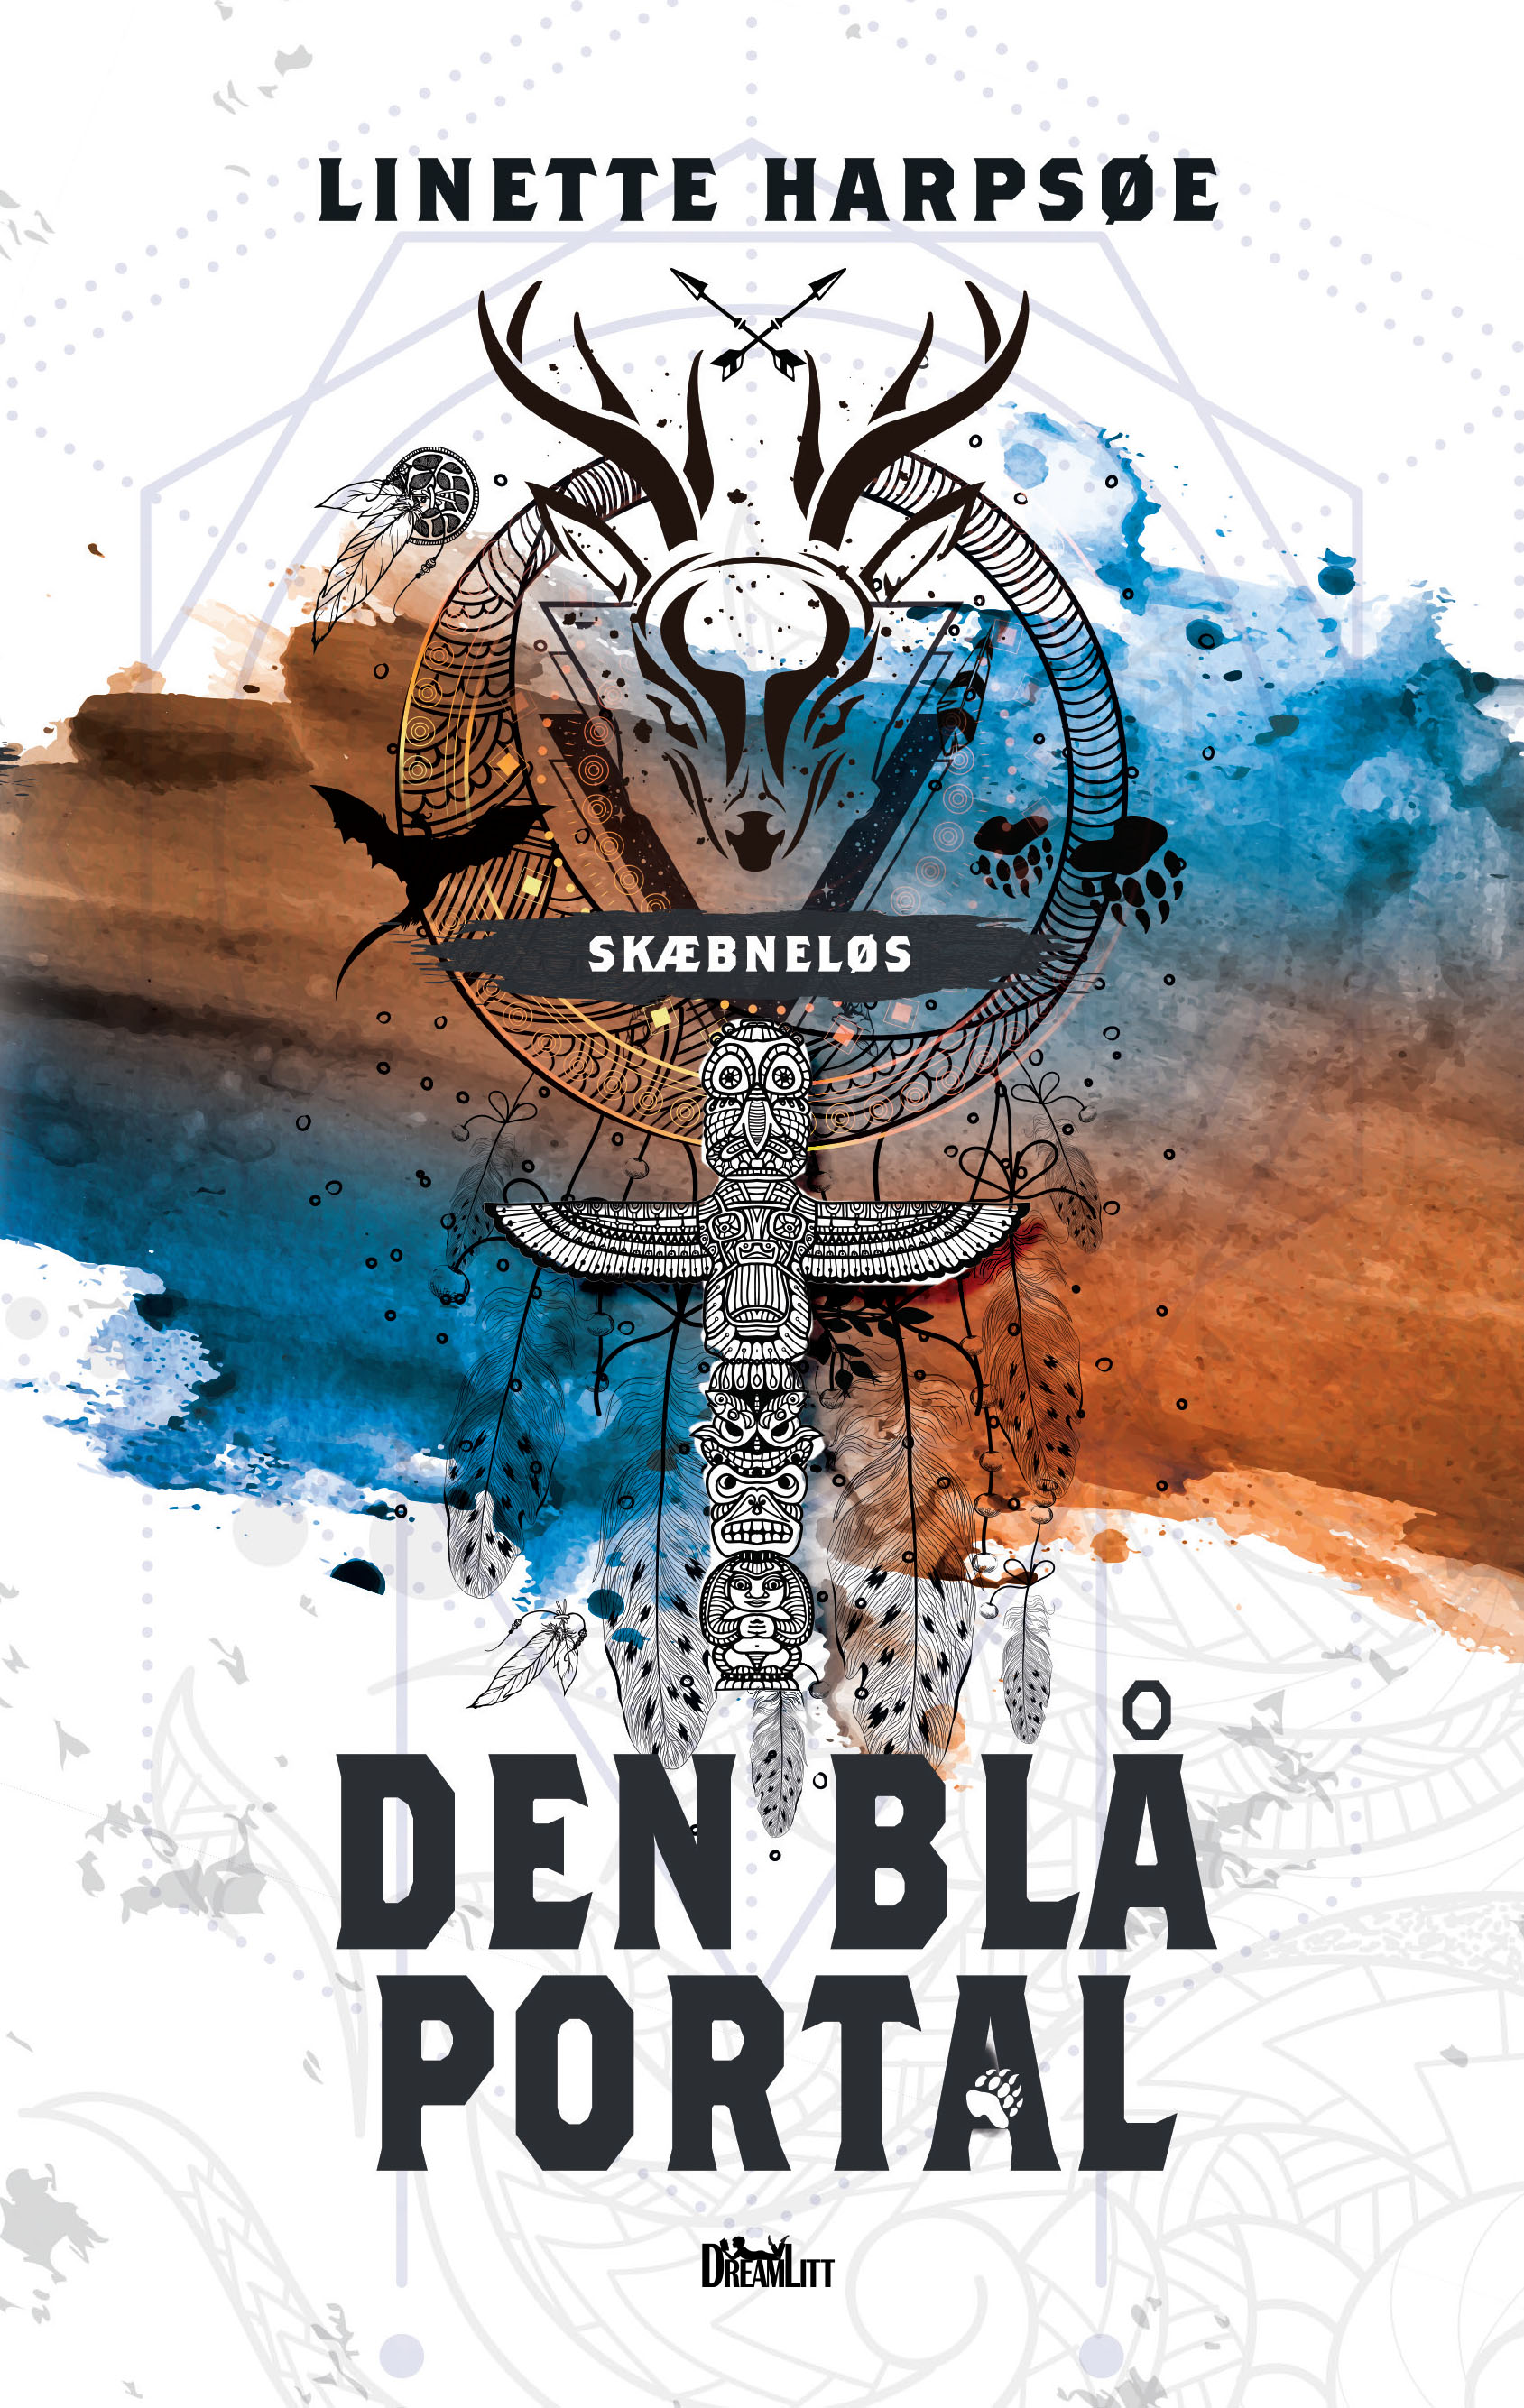 Skæbneløs: Den blå portal - Skæbneløs 2 - Linette Harpsøe - Bøger - DreamLitt - 9788771714692 - 10/9-2019